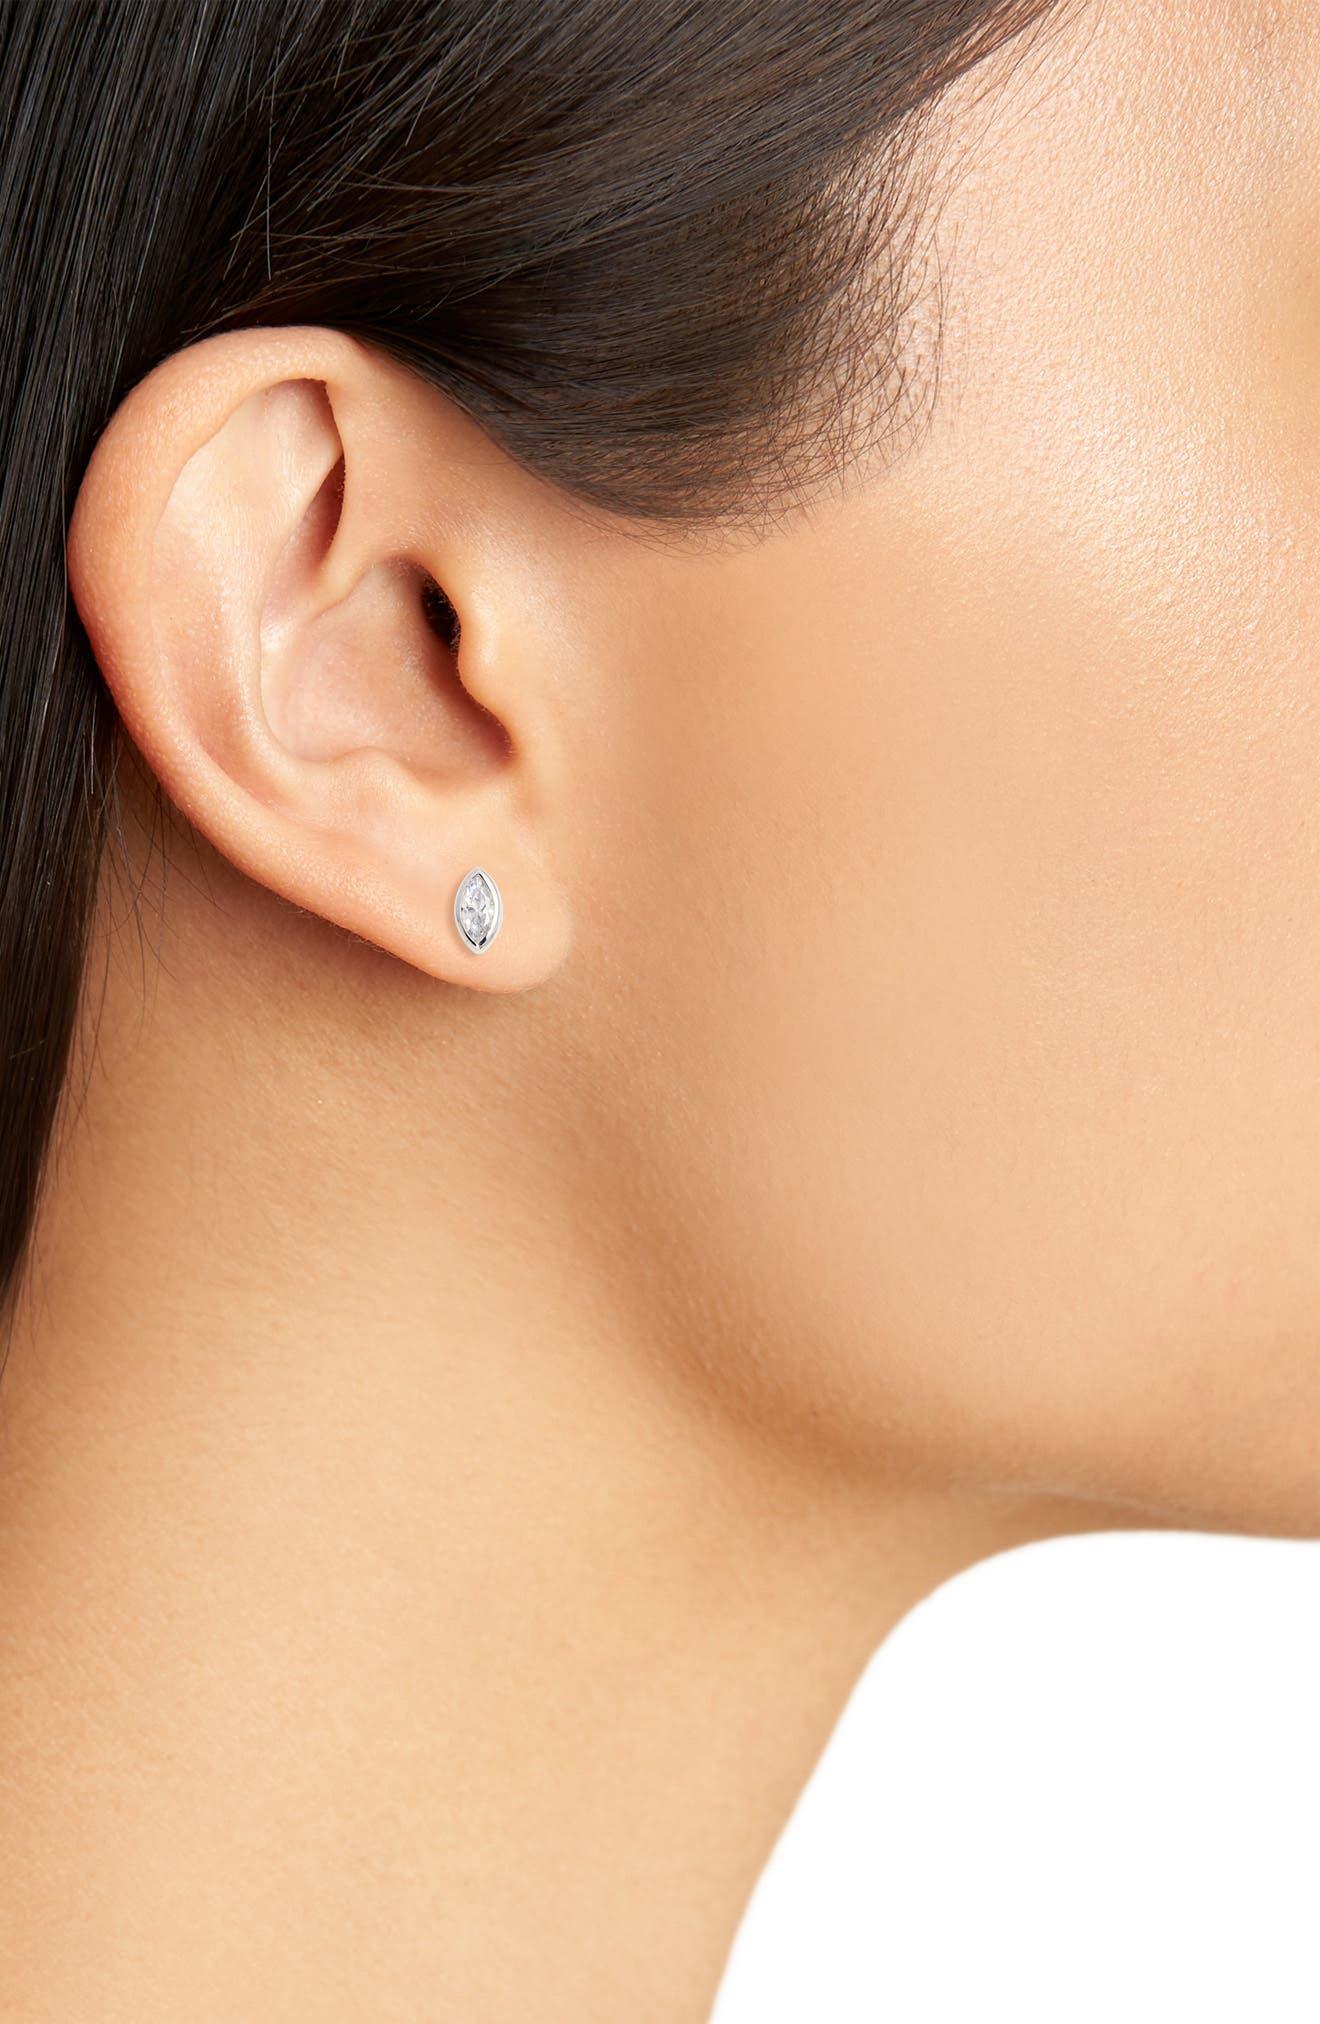 Bezel-Set Marquise-Cut Stud Earrings,                             Alternate thumbnail 2, color,                             SILVER/ CLEAR